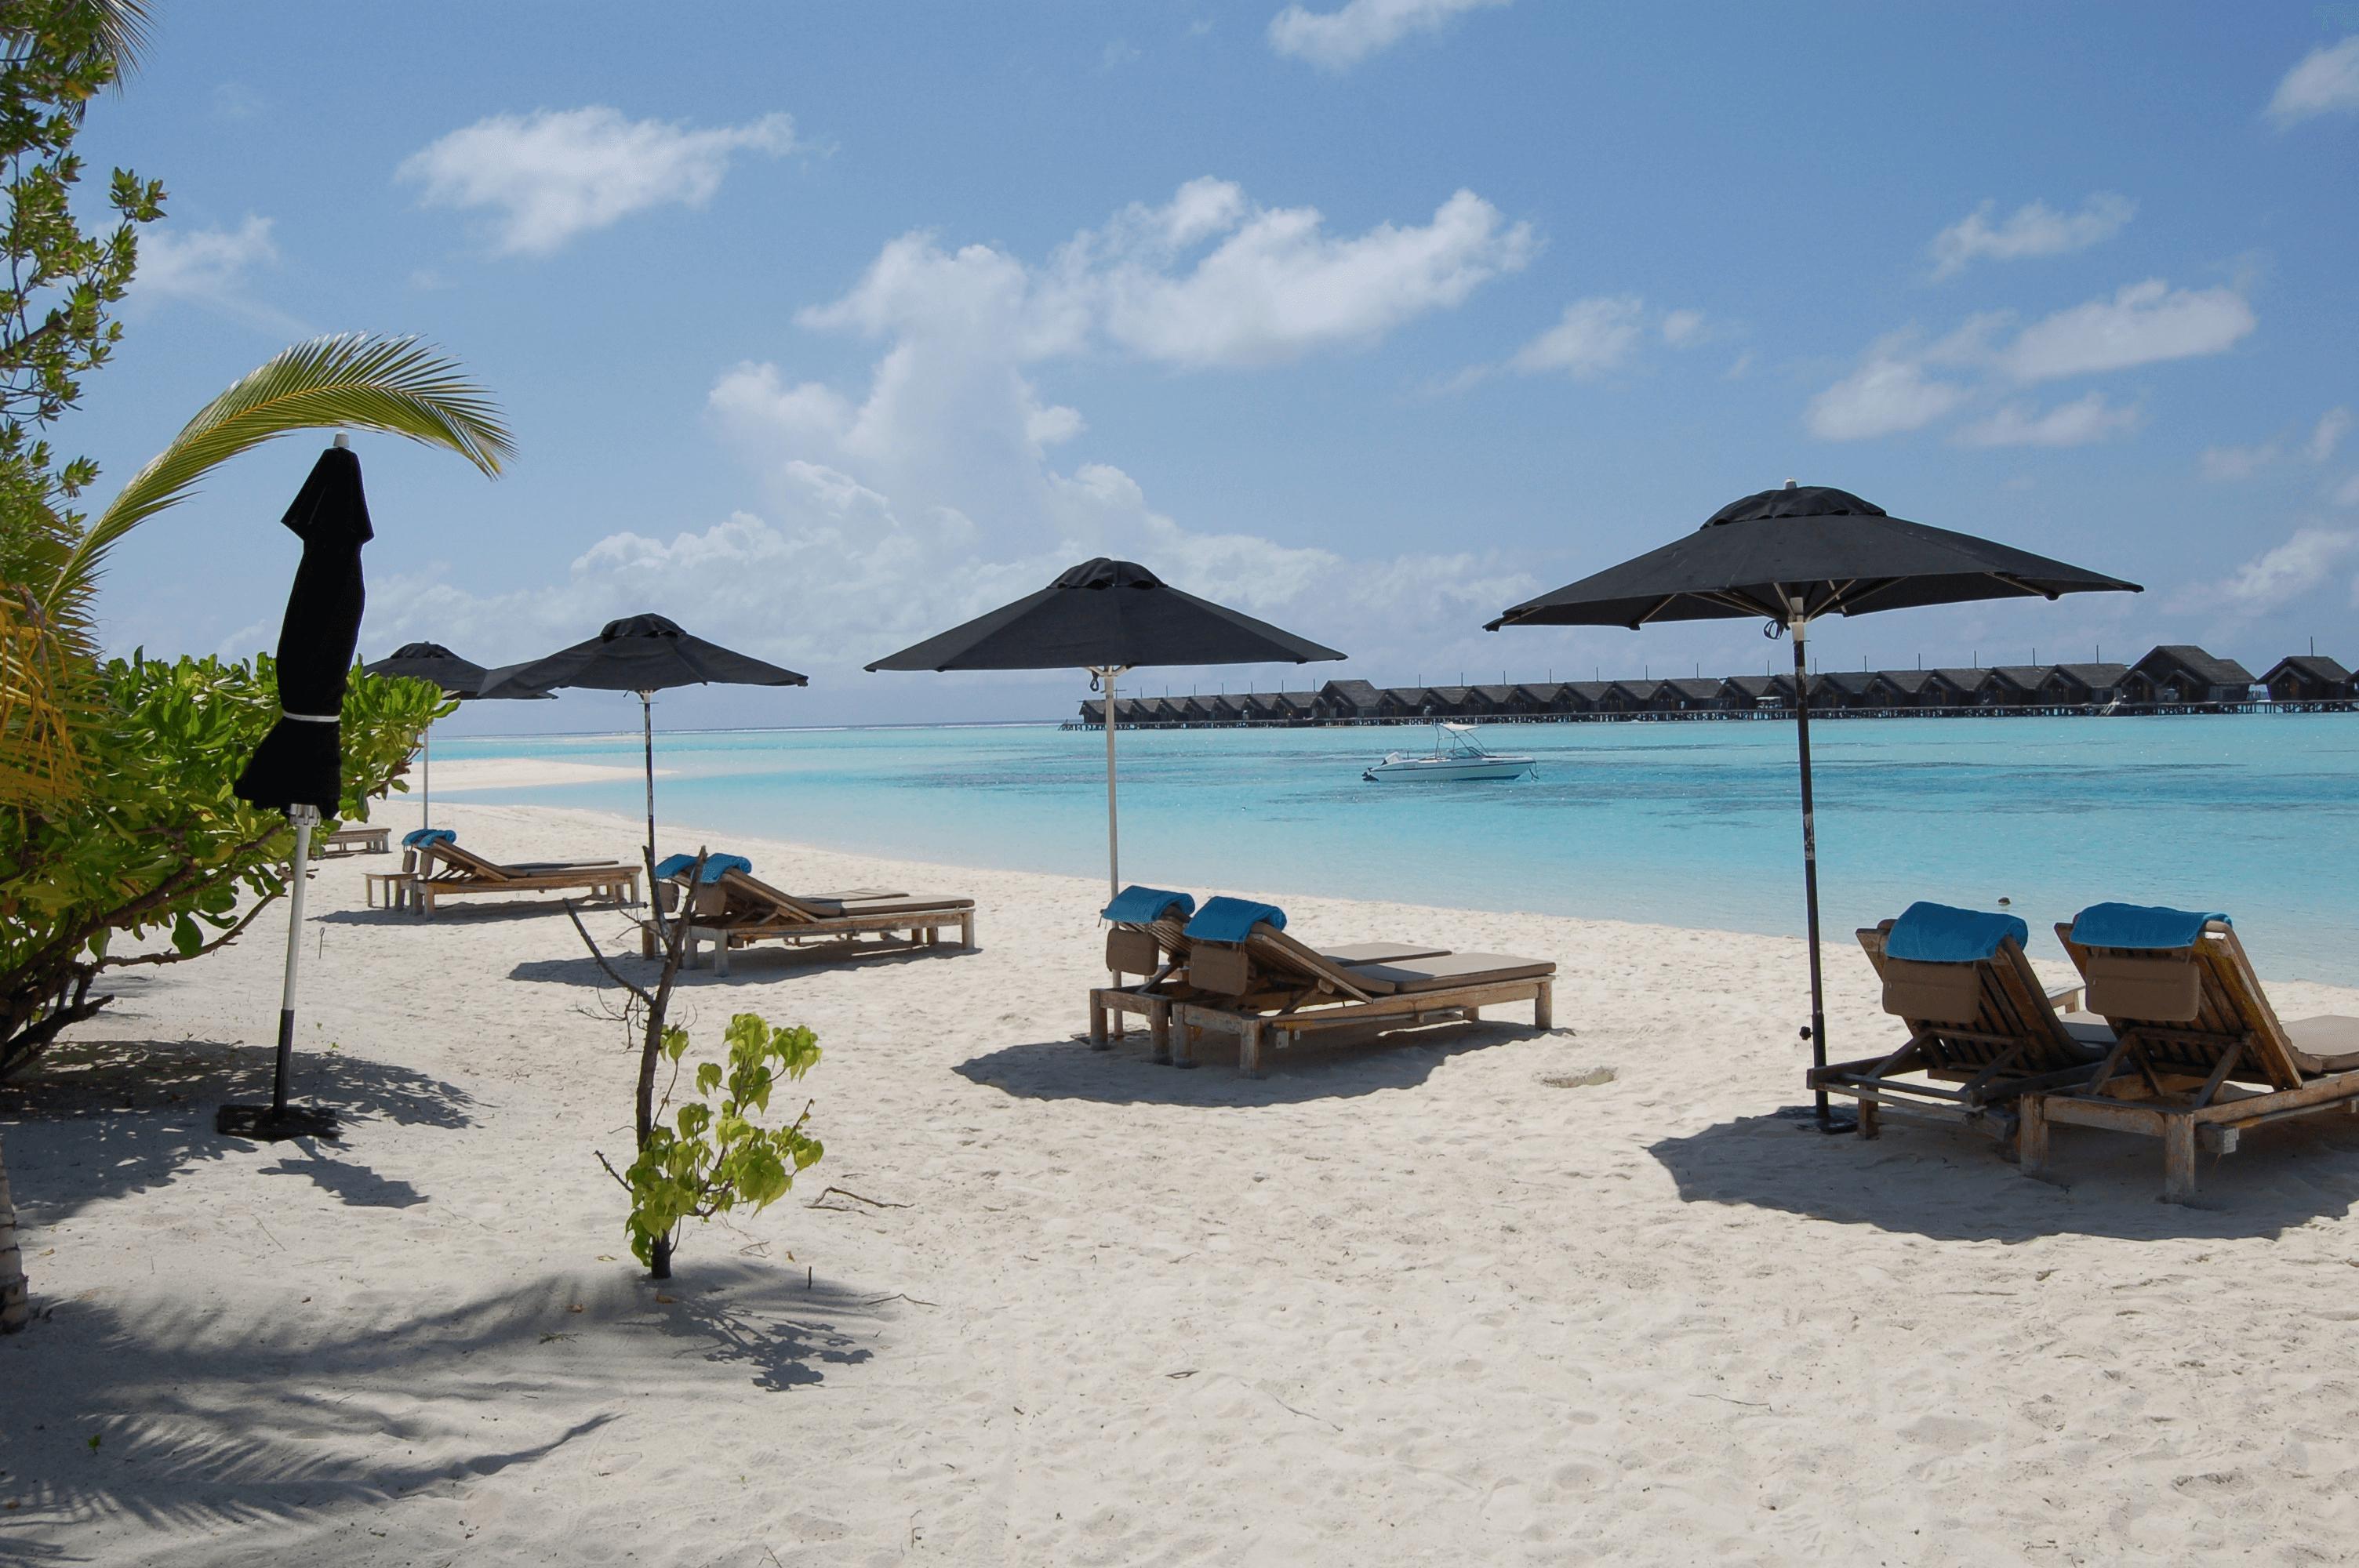 LUX, 5-stjernes Maldivene